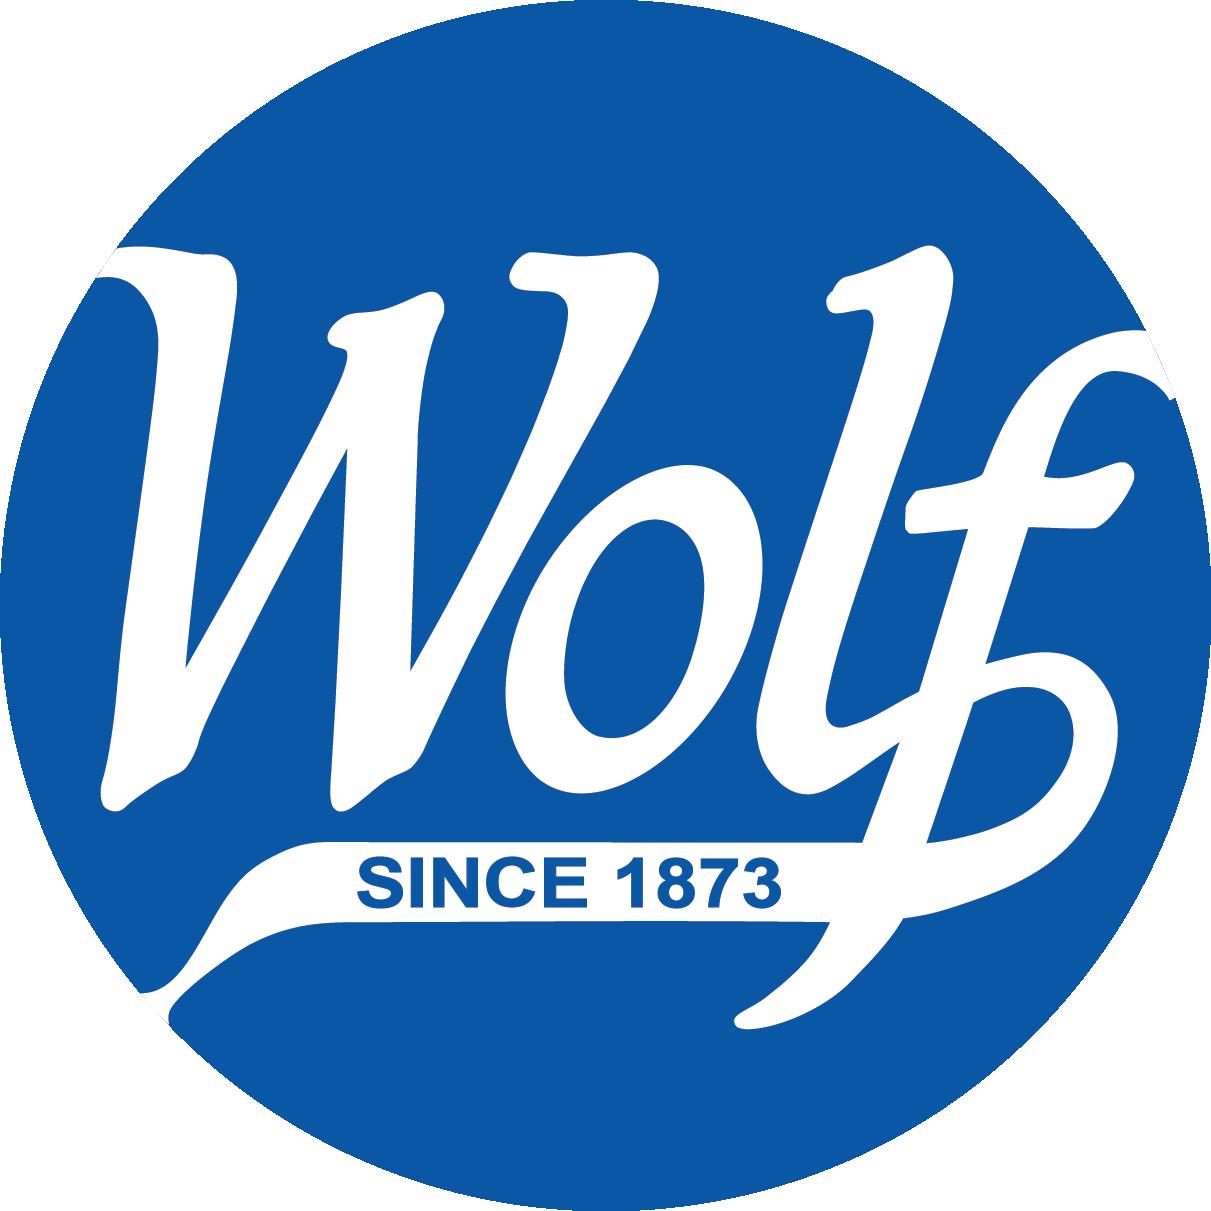 Wolf since 1873 logo